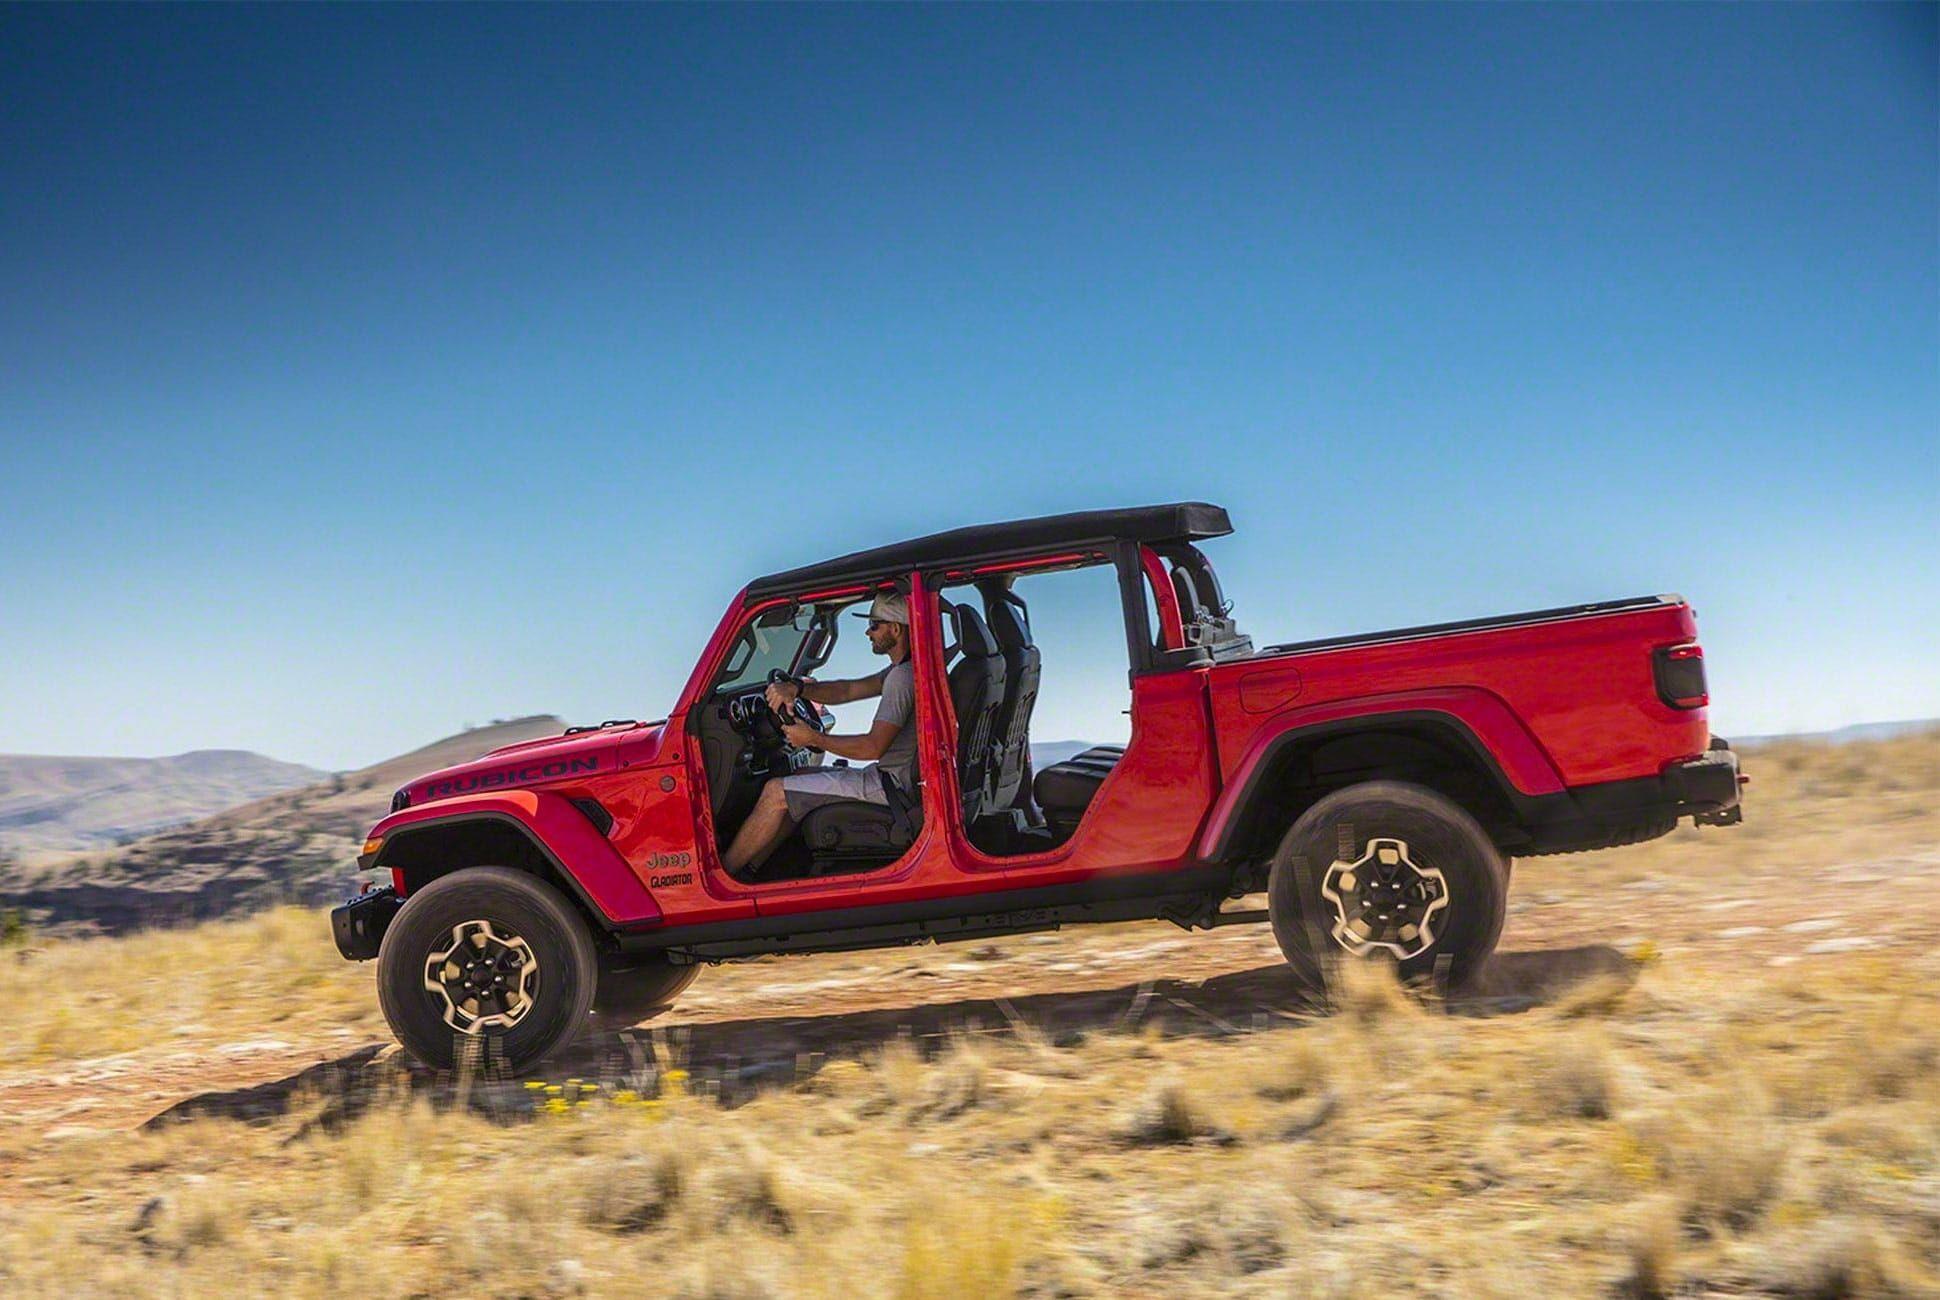 2019-Jeep-Gladiator-gear-patrol-slide-3